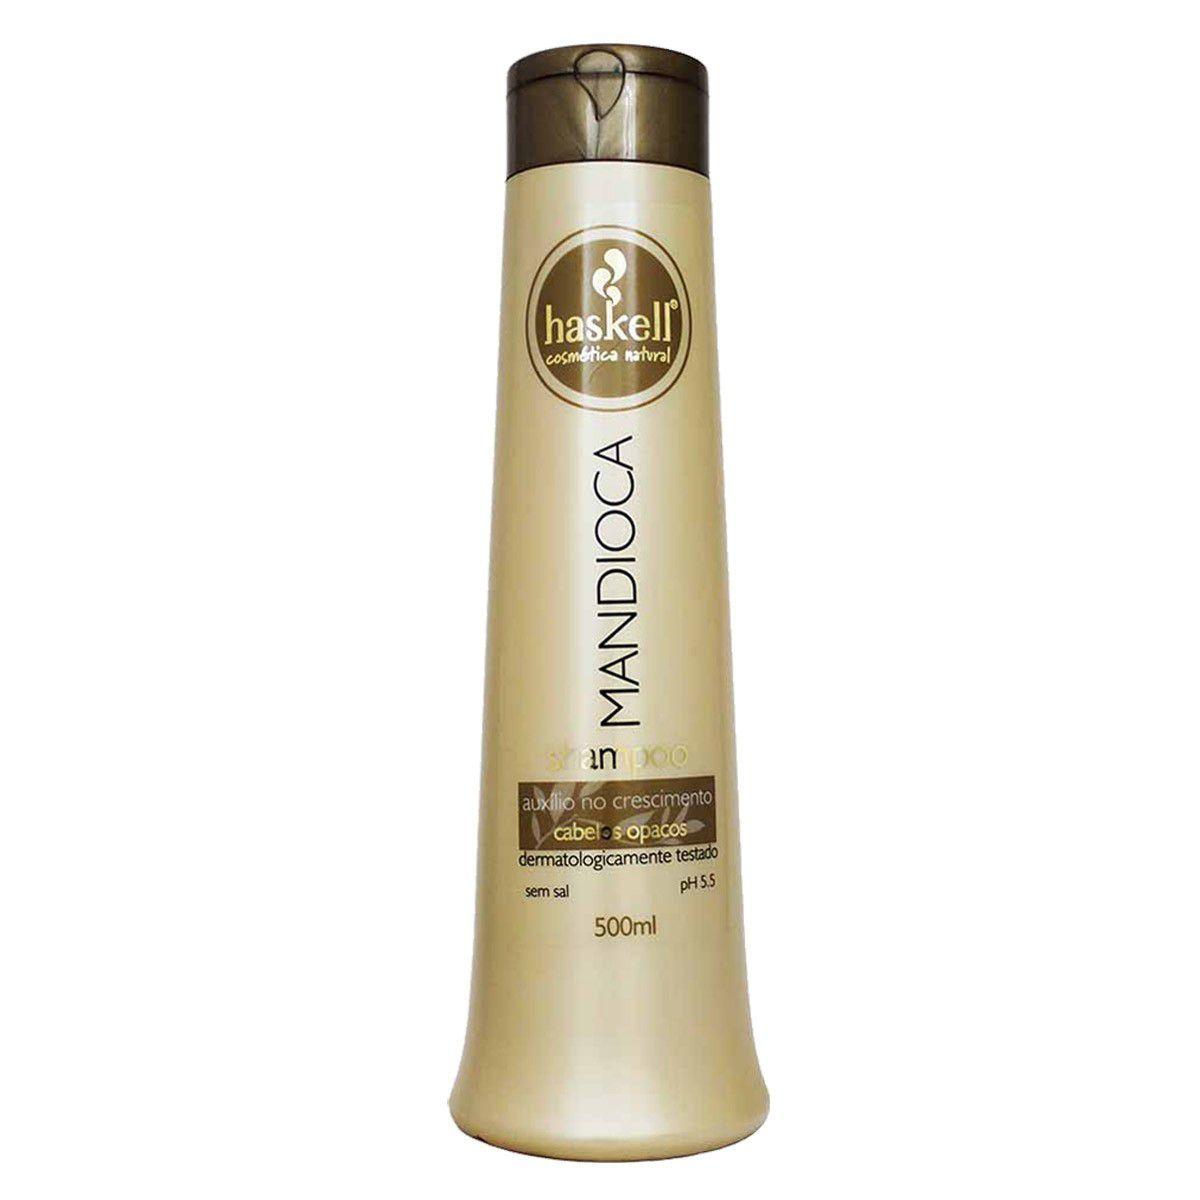 Kit Haskell Mandioca Shampoo 500 ml + Condicionador 500ml + Mascara 500gr